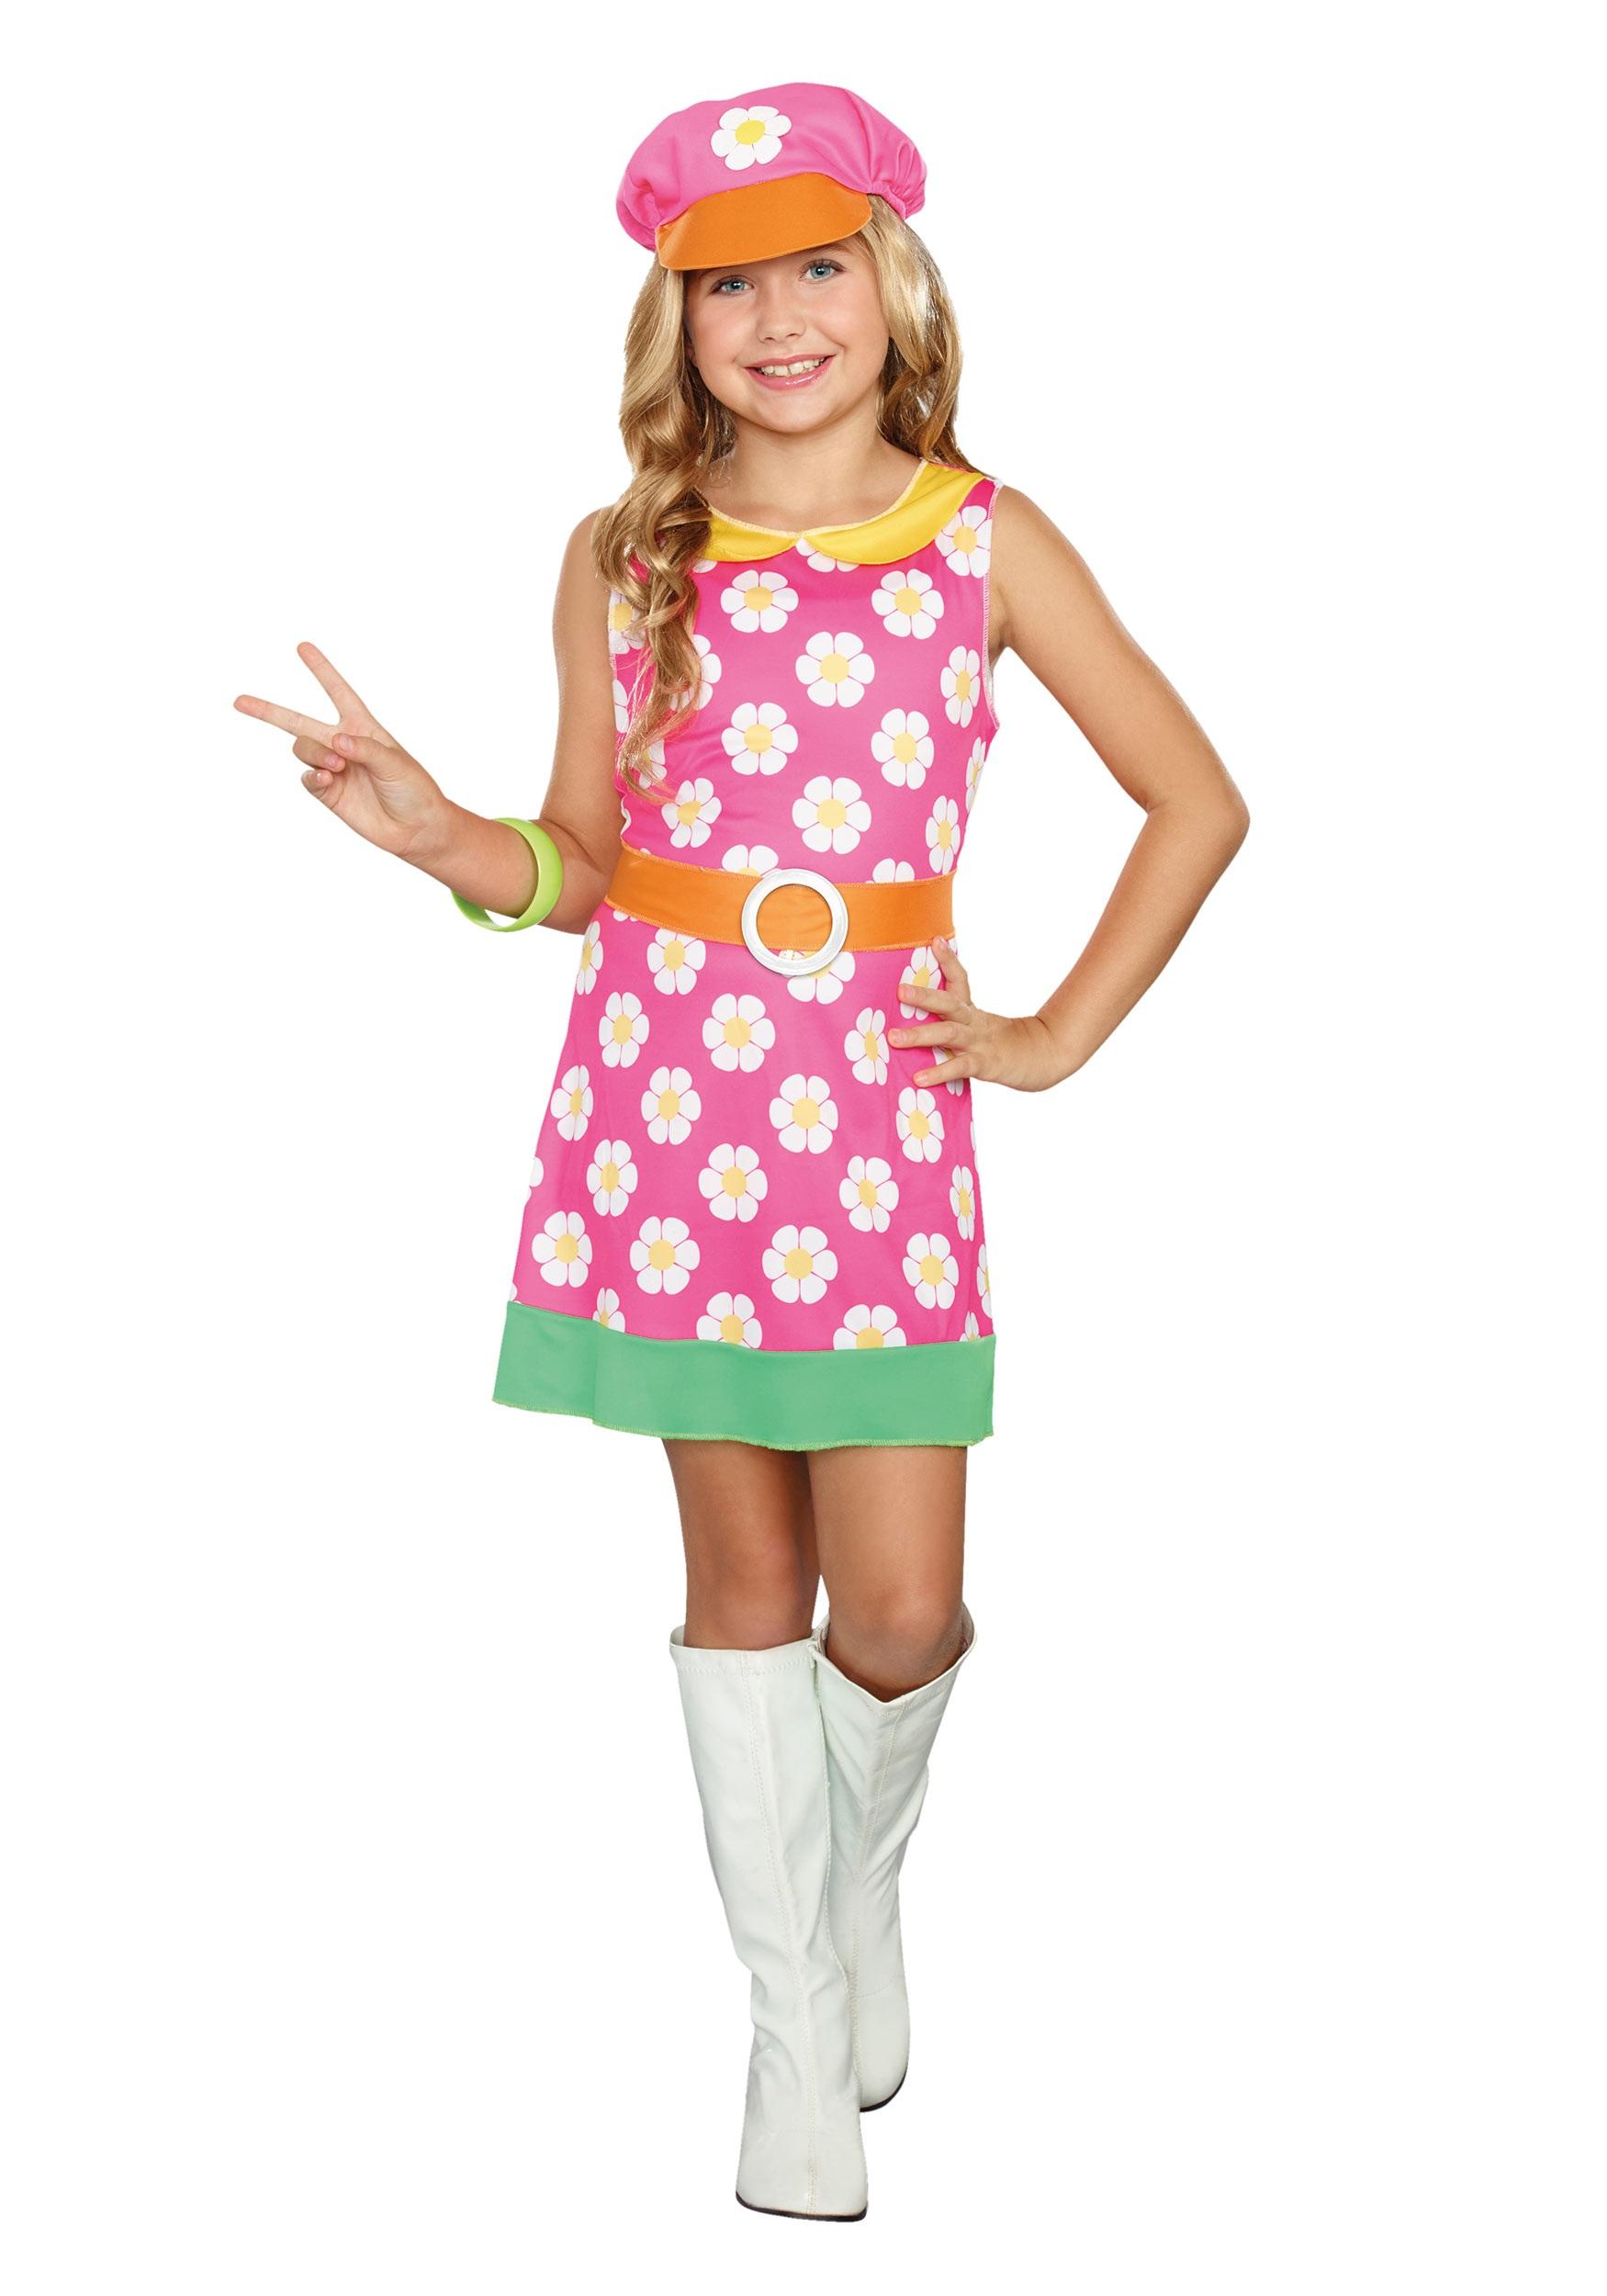 Child Deluxe Mario Raccoon Costume Price: 49.99 Adult Deluxe ...